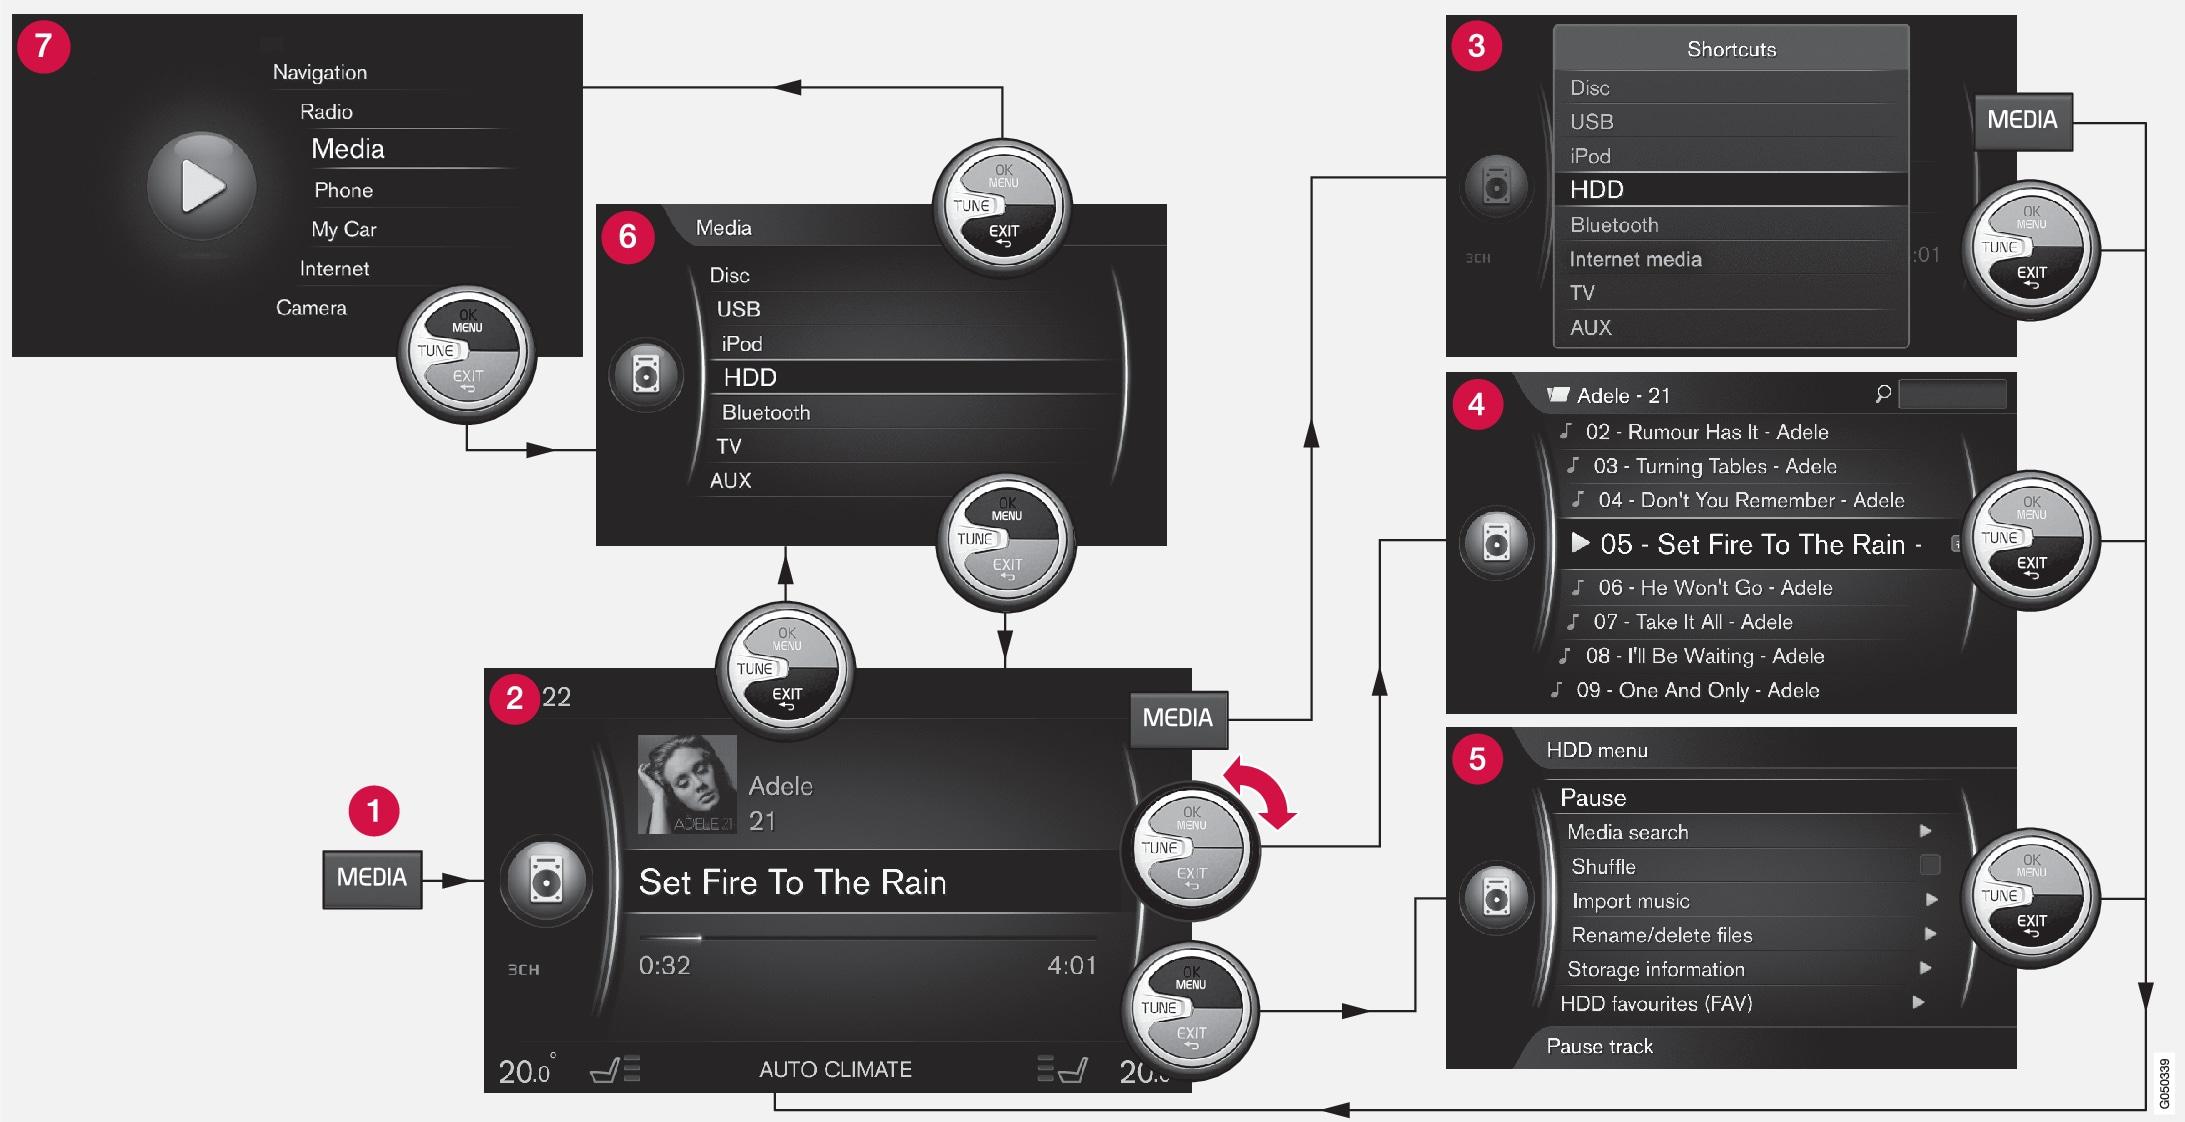 P3-1346-x60-Menu handling_Flow chart